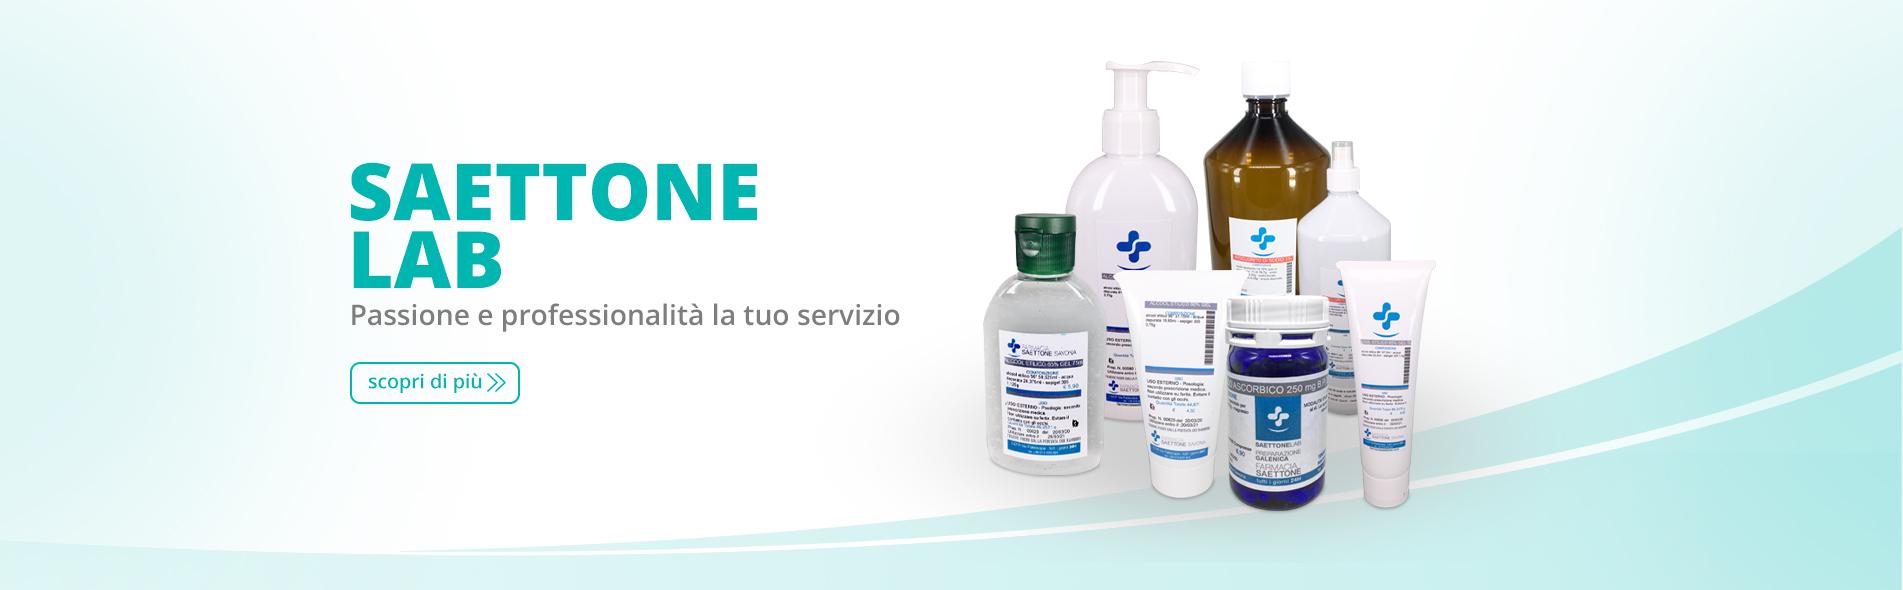 Saettone Lab